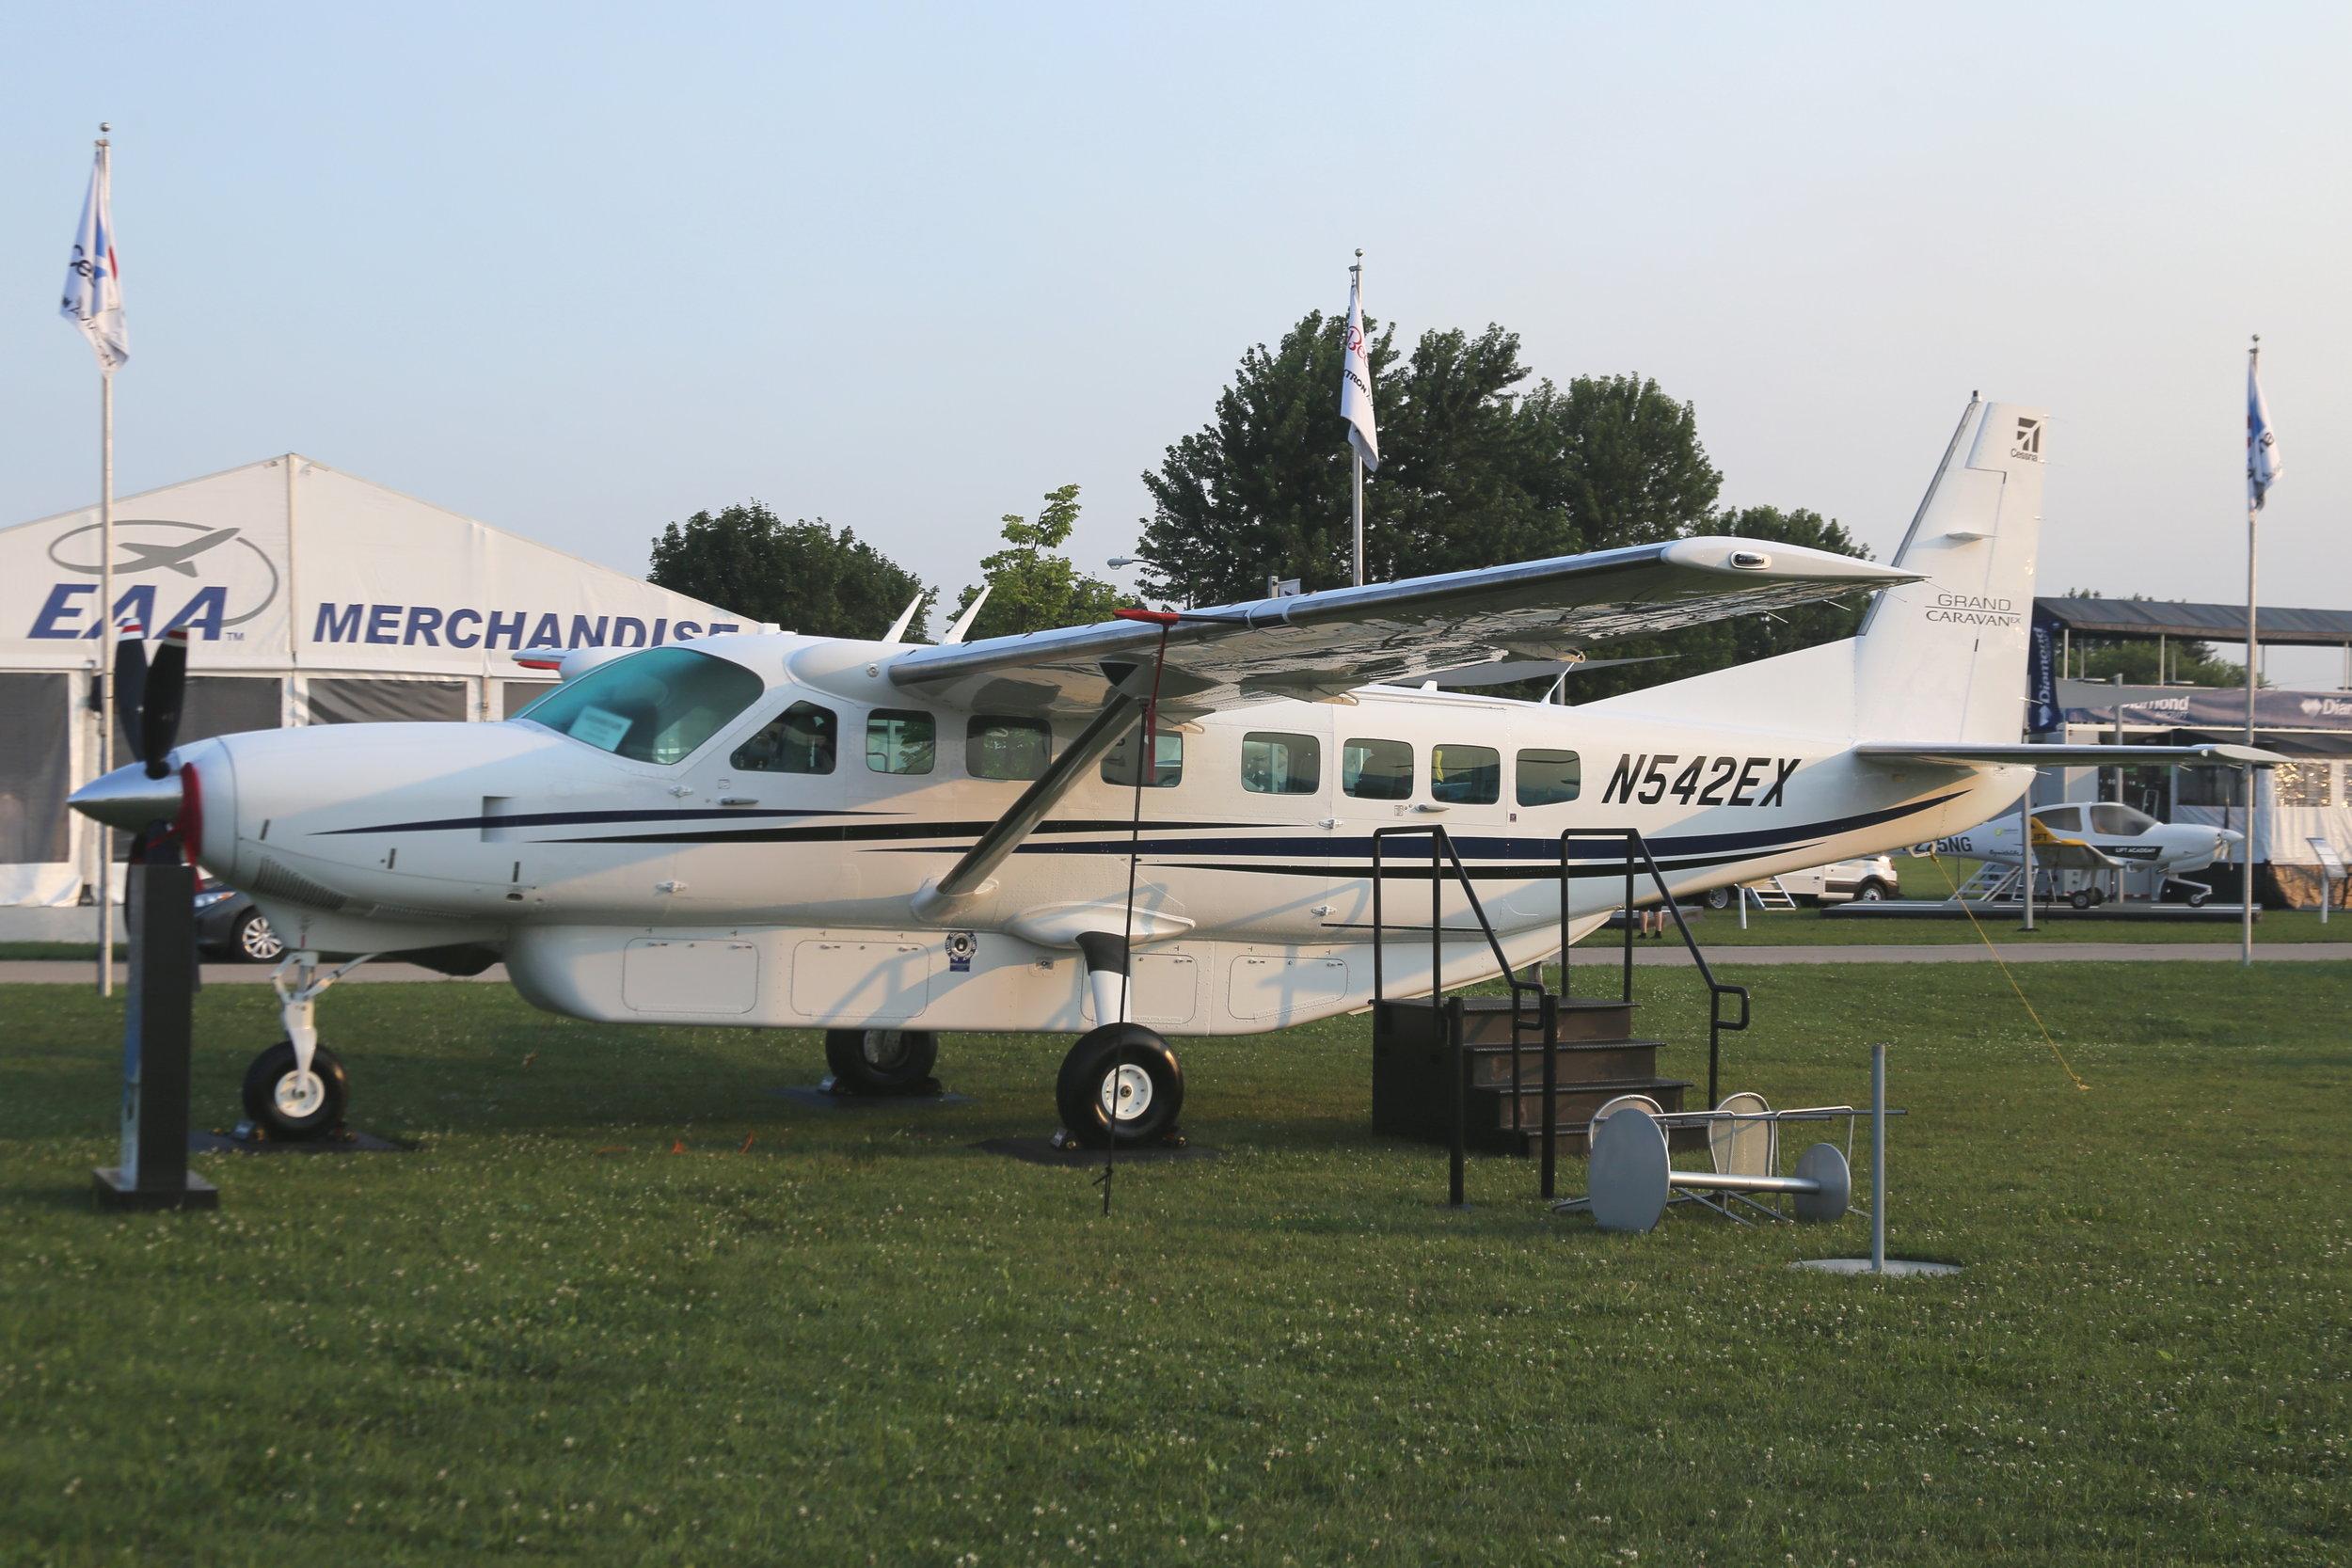 N542EX Textron Aviation C208 taken at Oshkosh 23rd July 2018 by John Wood